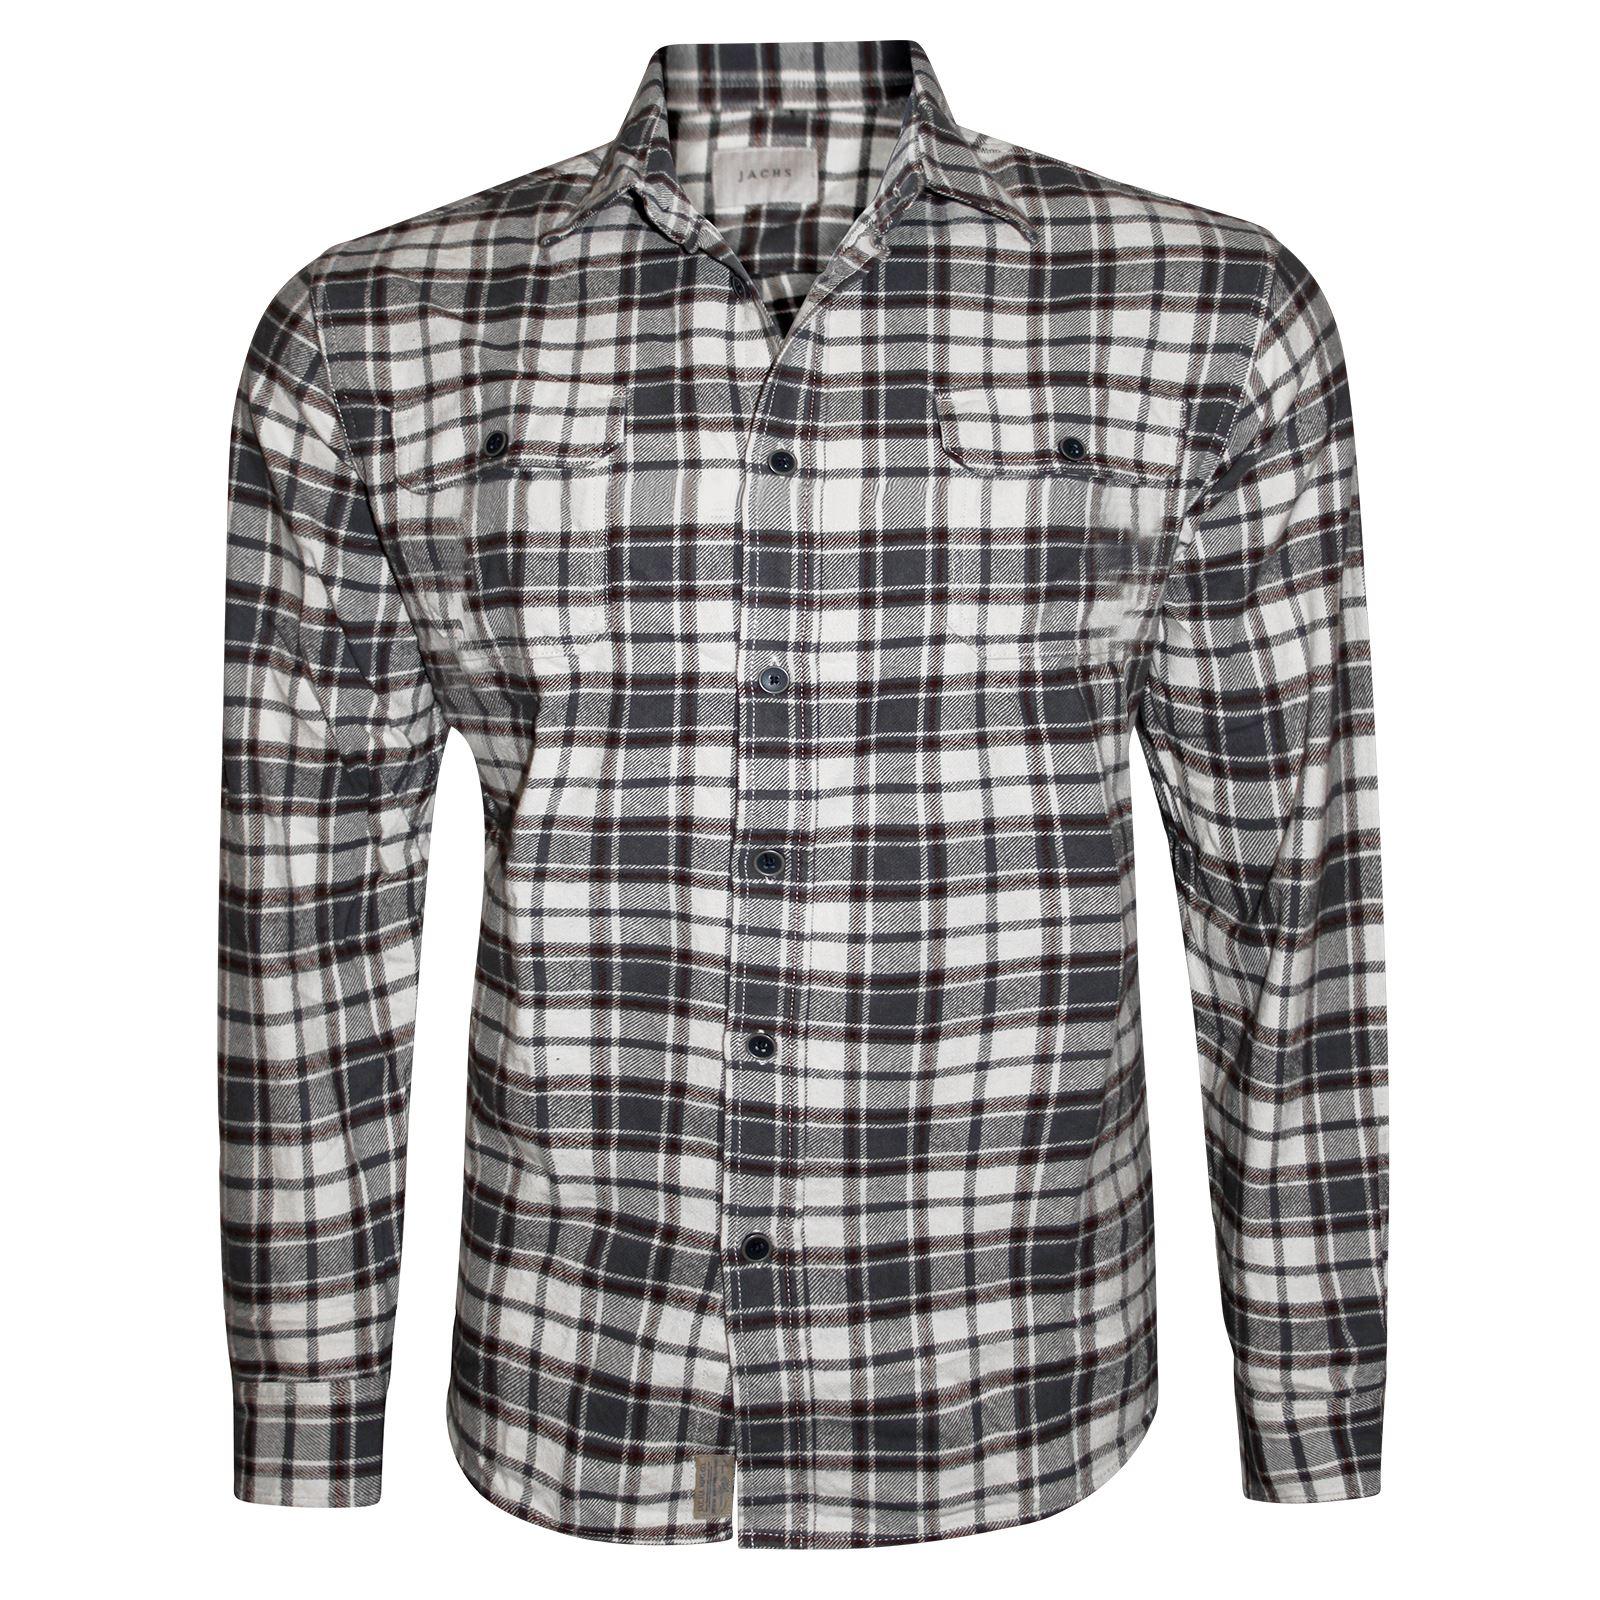 Mens Flannel Brushed Fleece Shirt Plaid Lumberjack Check